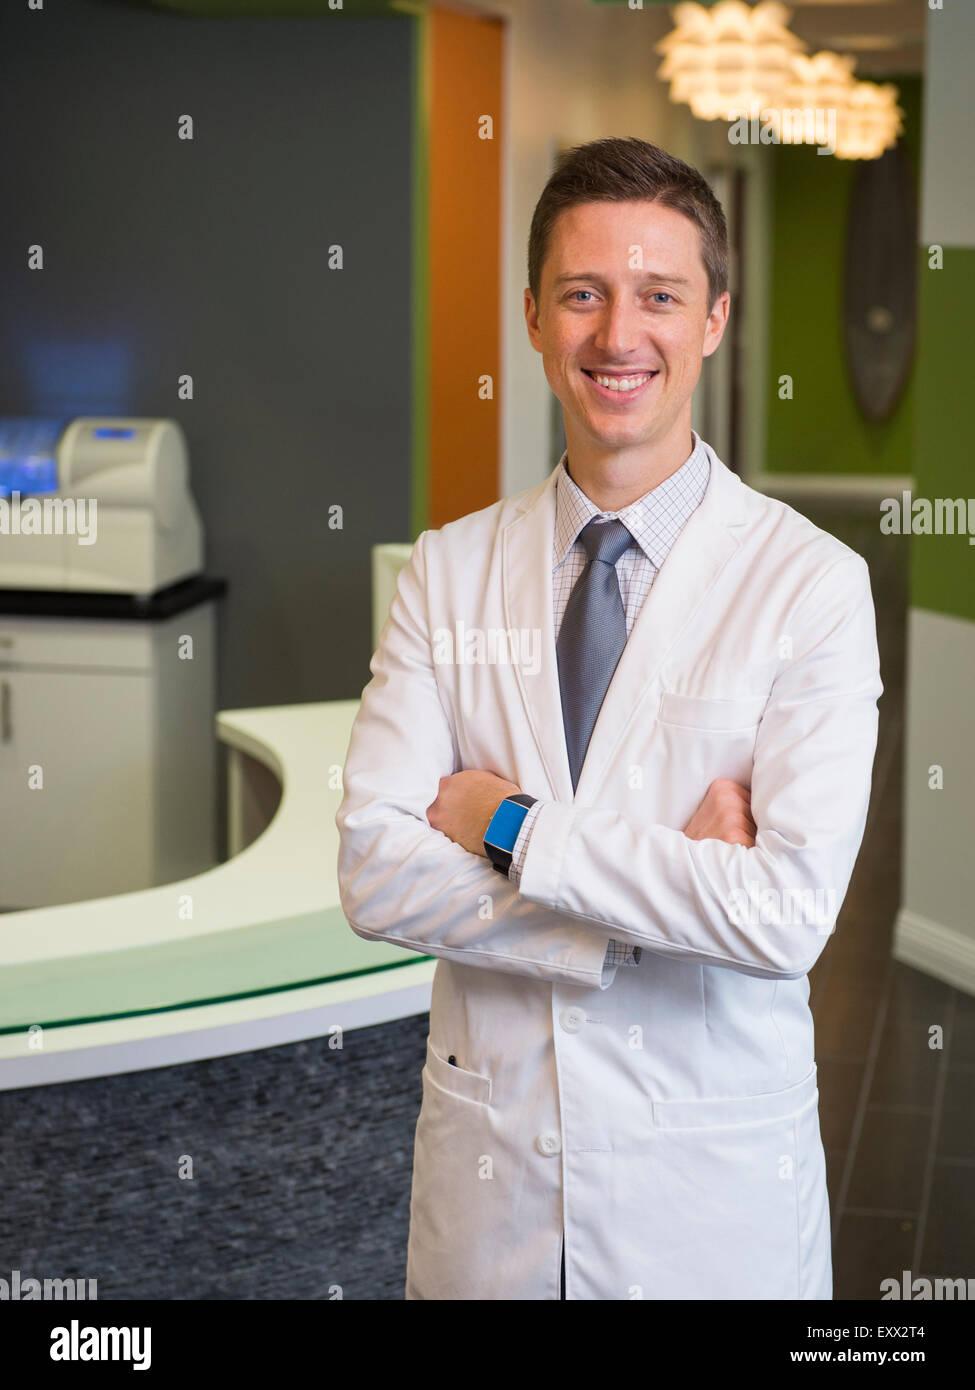 Portrait of smiling dentist - Stock Image